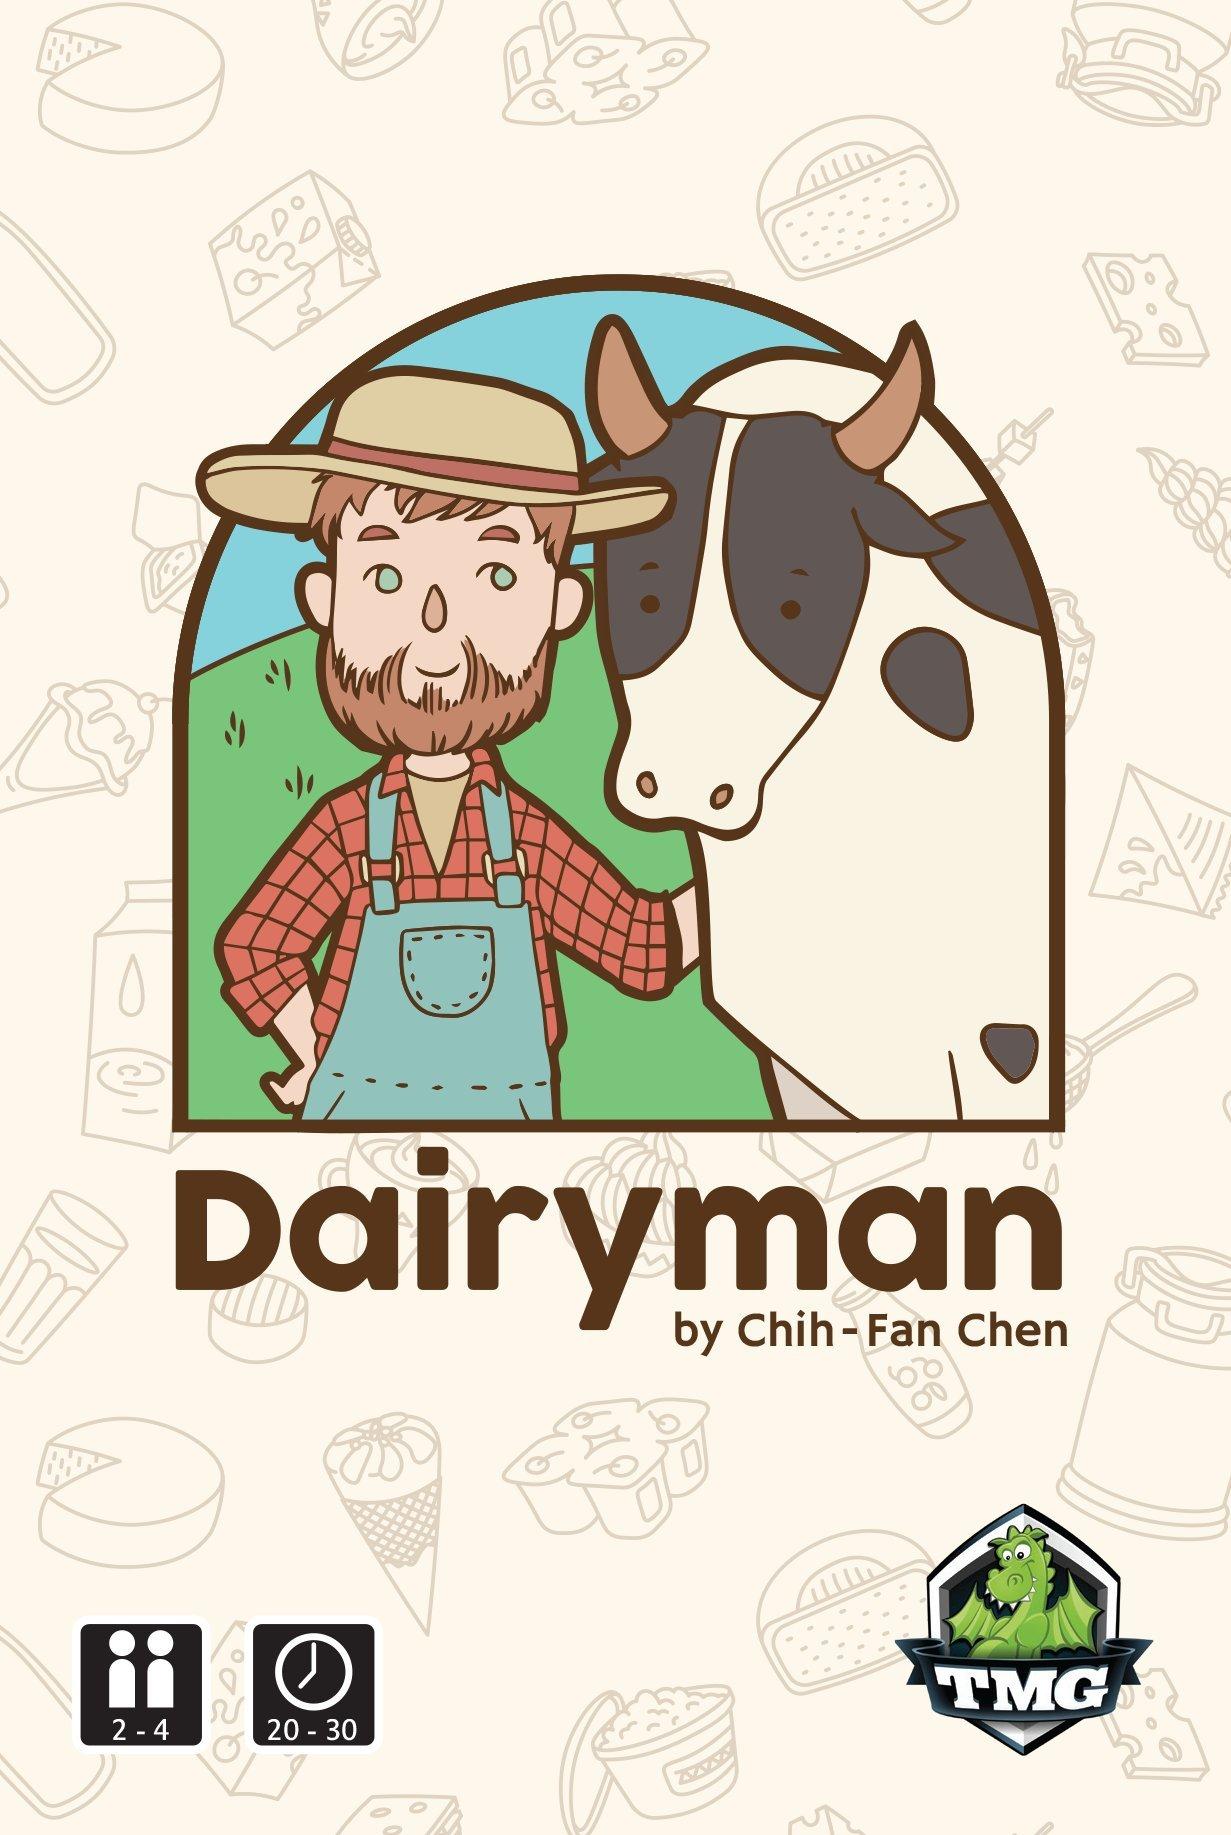 Dairyman Dice Game